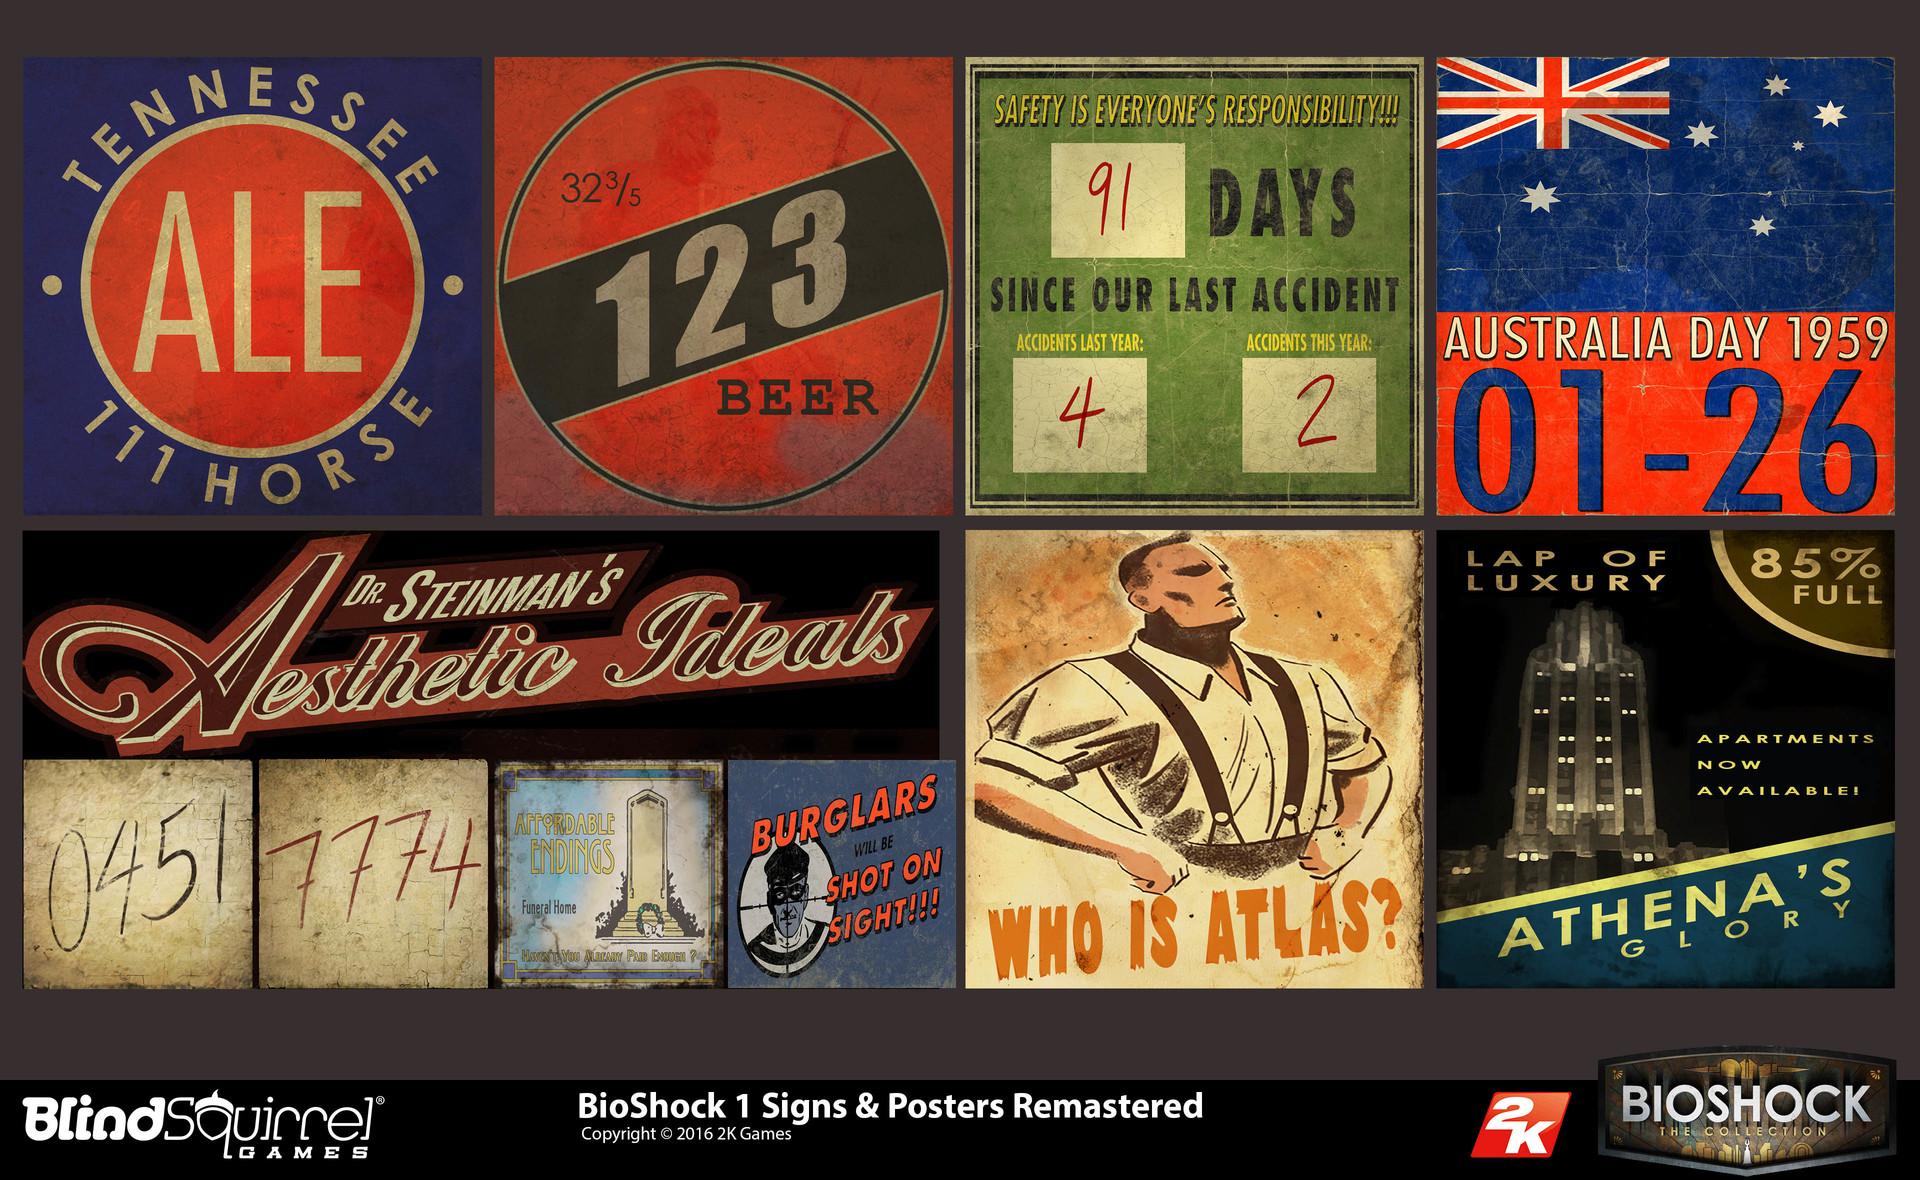 Jeff zugale b1 signage remasters 1